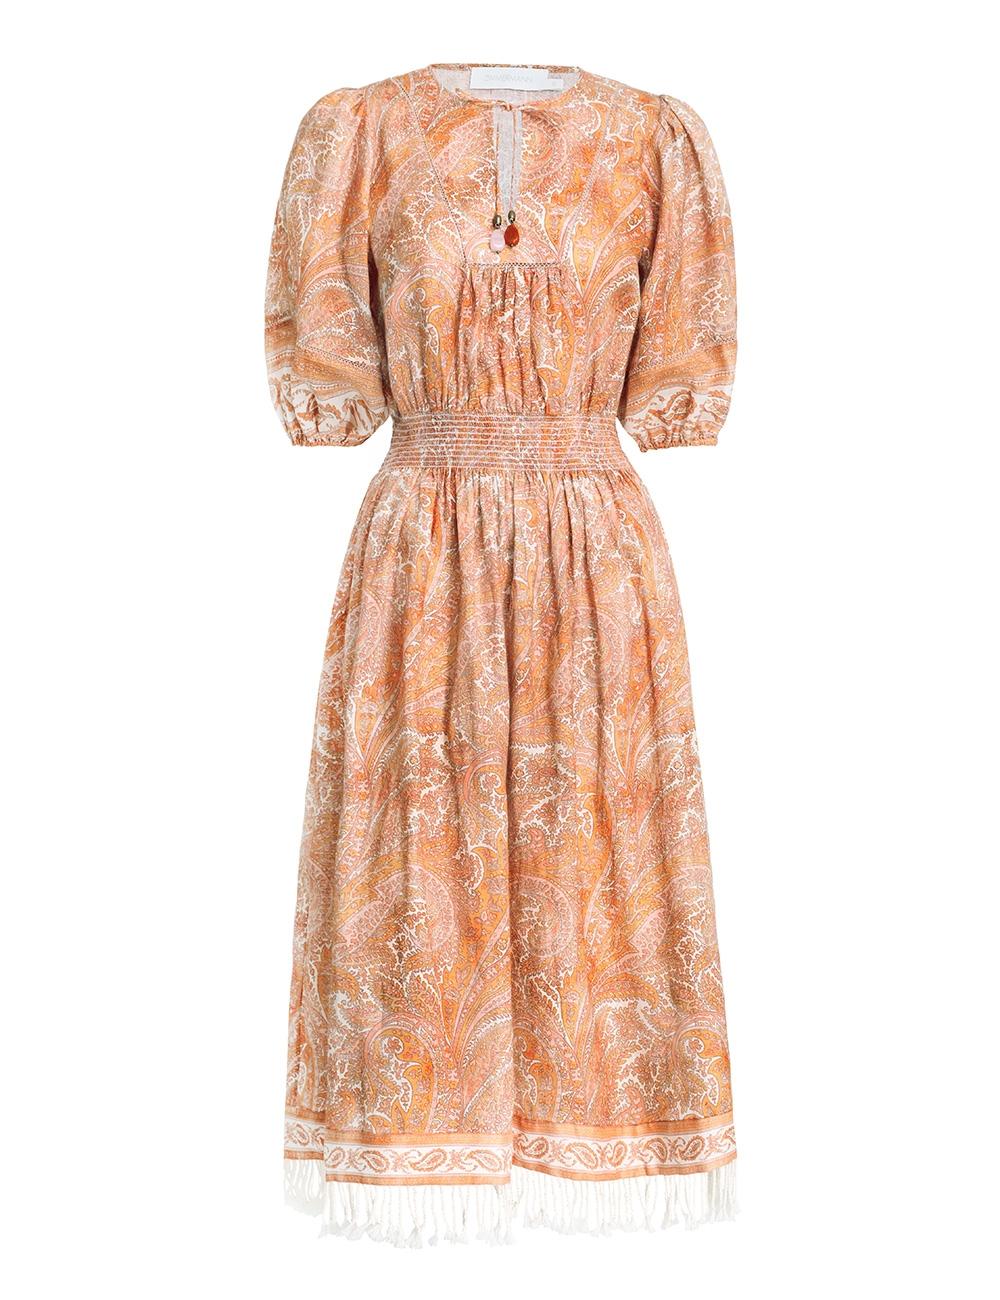 Brighton Shirred Waist Dress